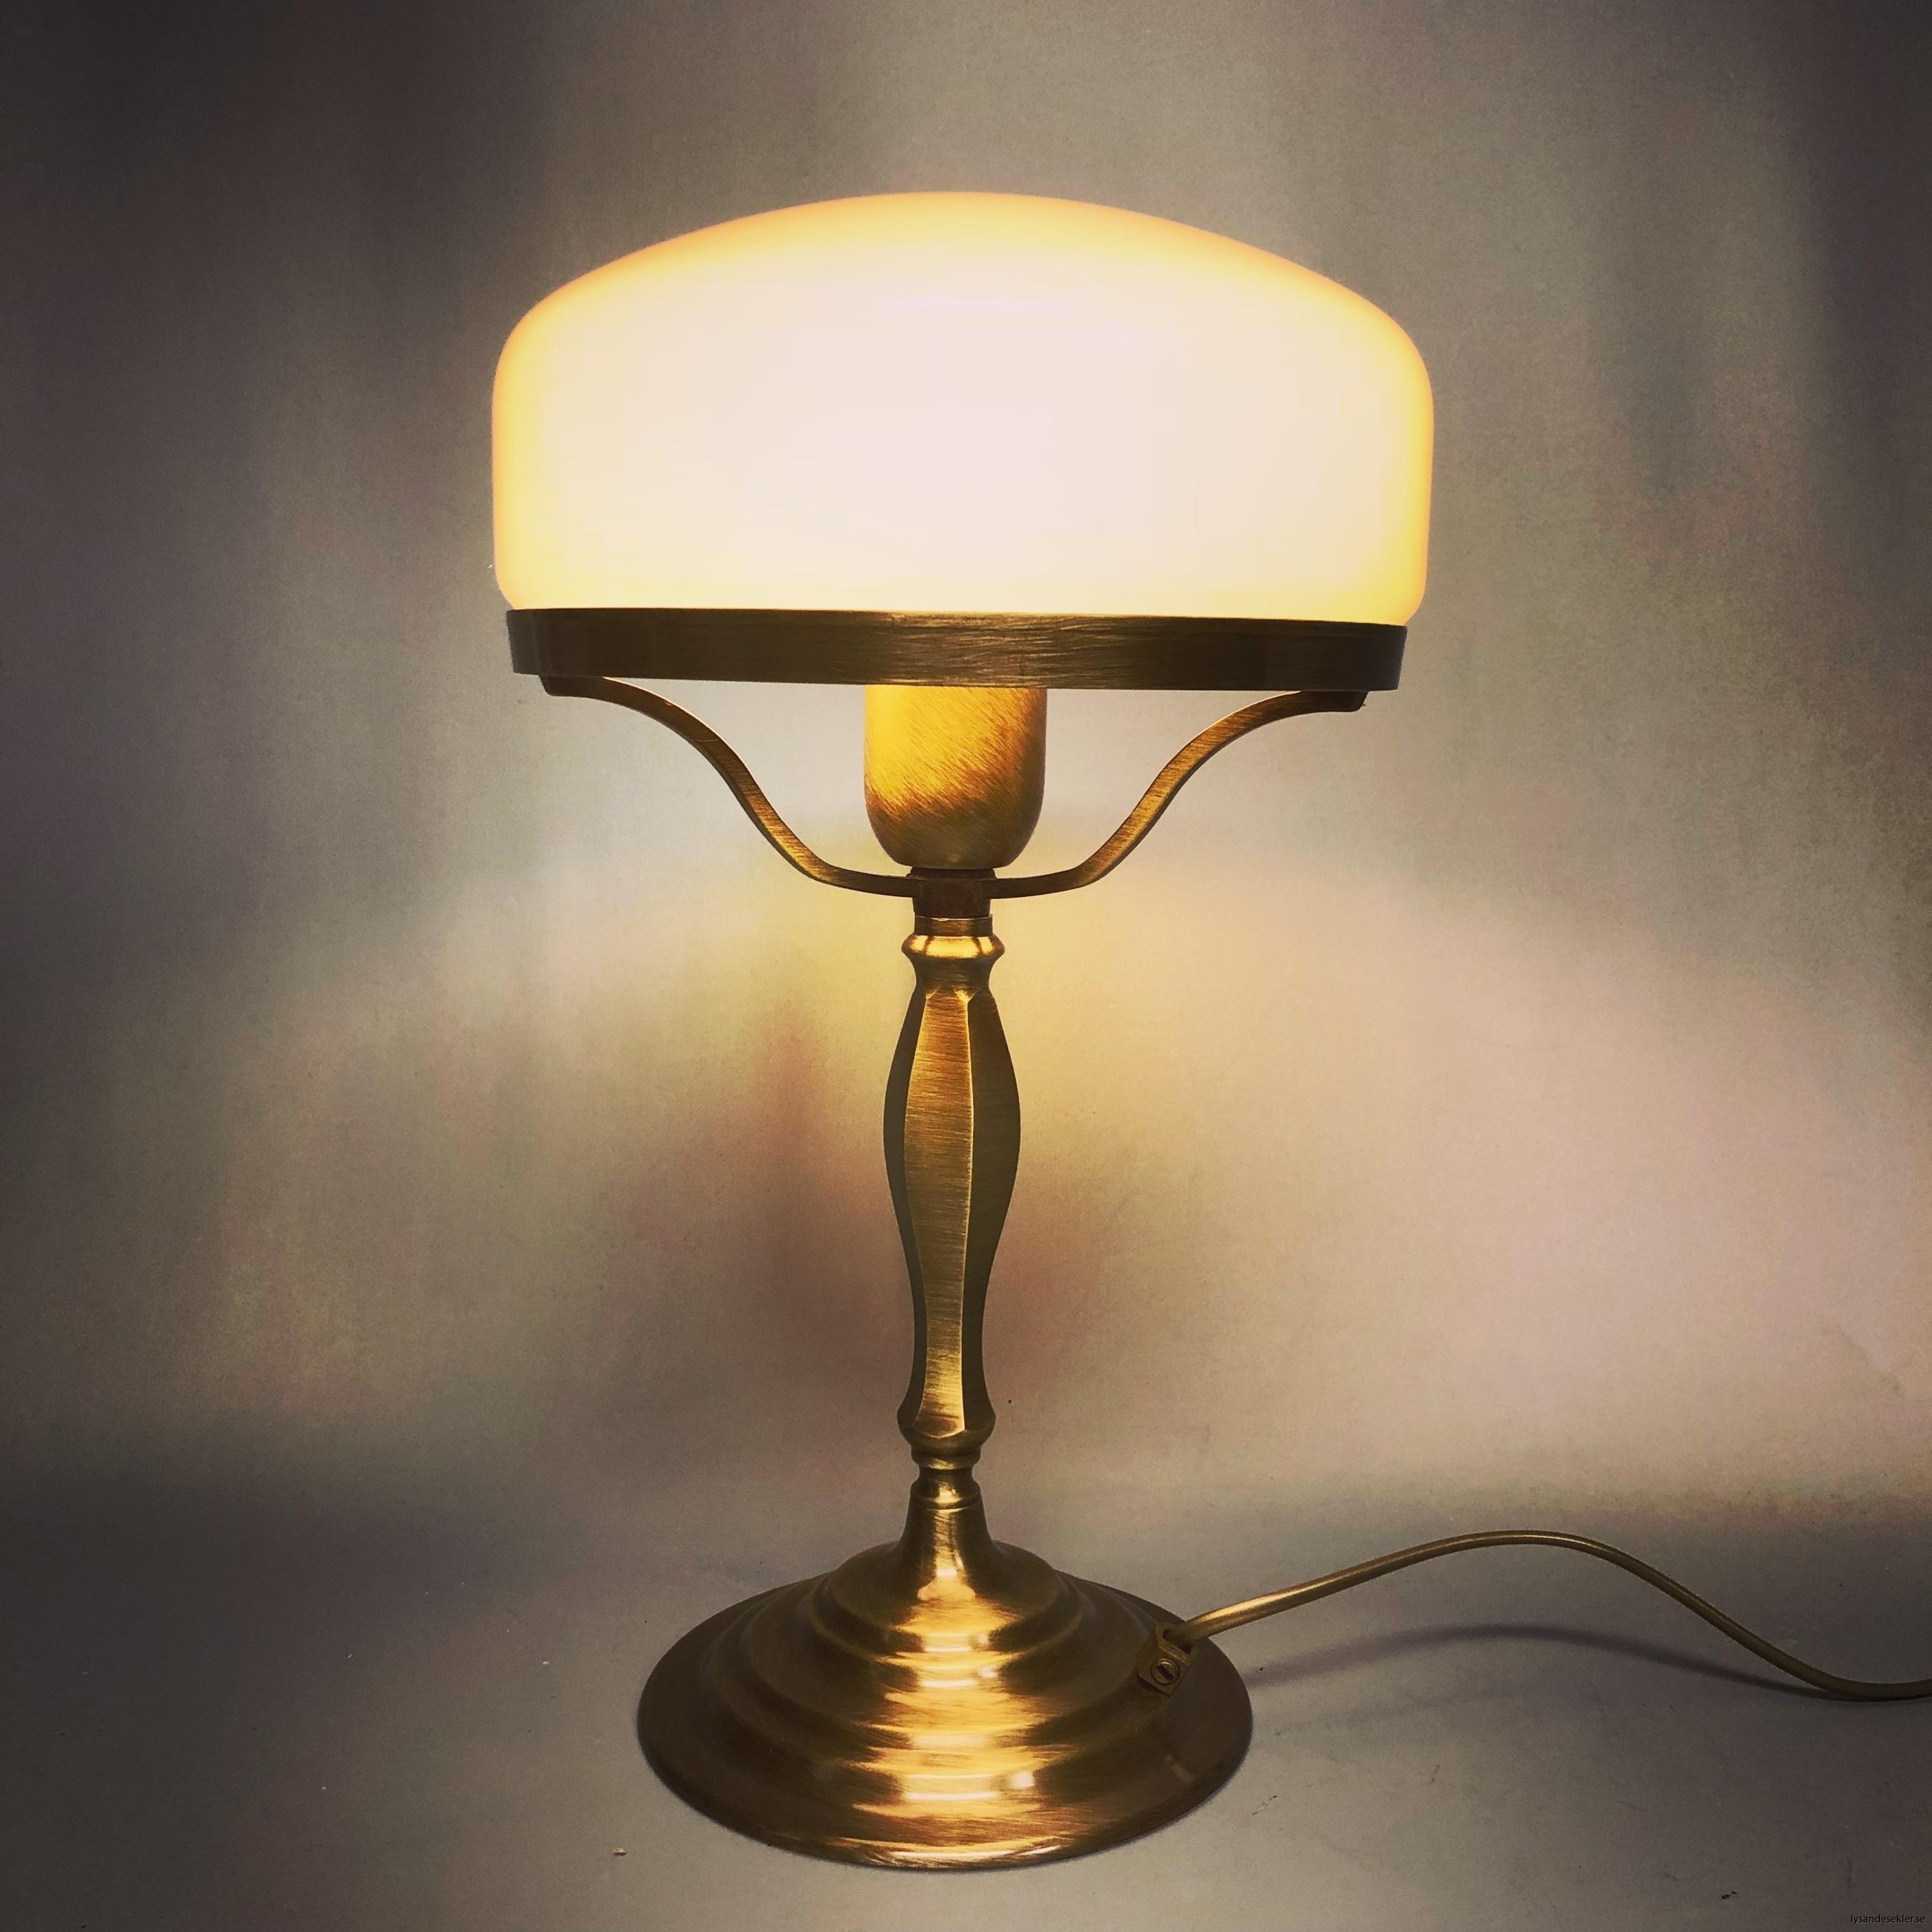 strindbergslampa strindbergslampor strindberg lampa skärm kupa strindbergsskärm strindbergskupa46